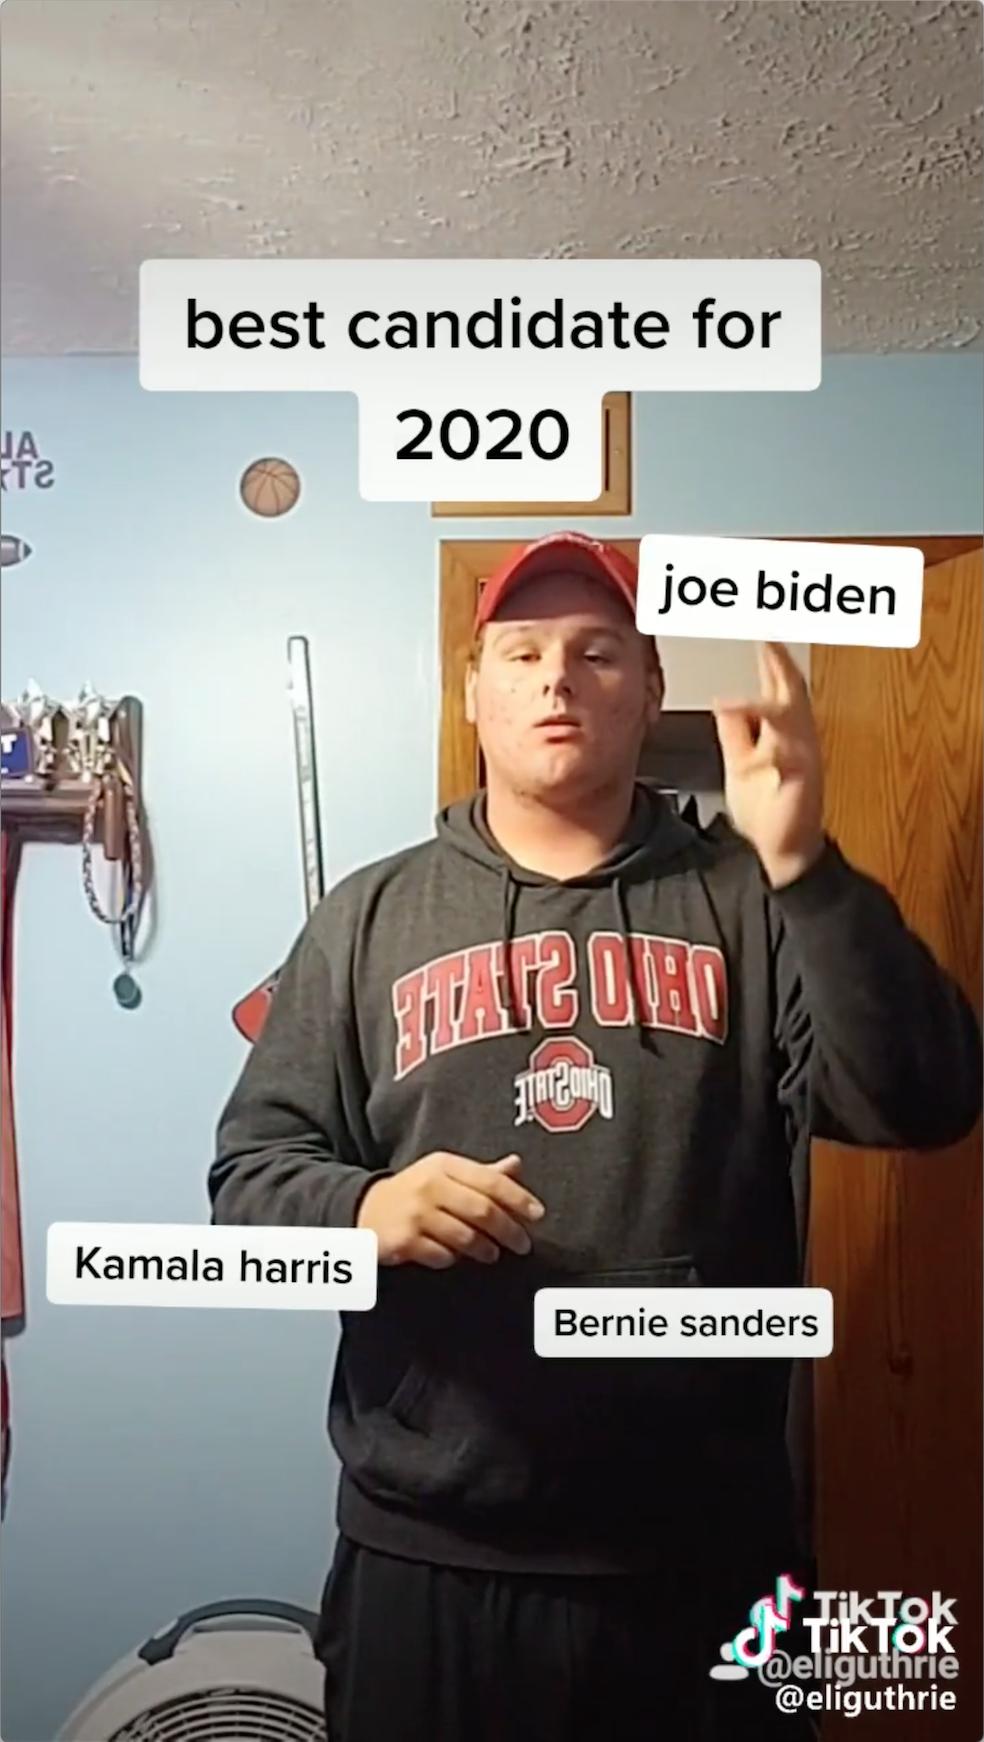 Still from a video showing man using a finger gun to shoot name of presidential candidate Joe Biden